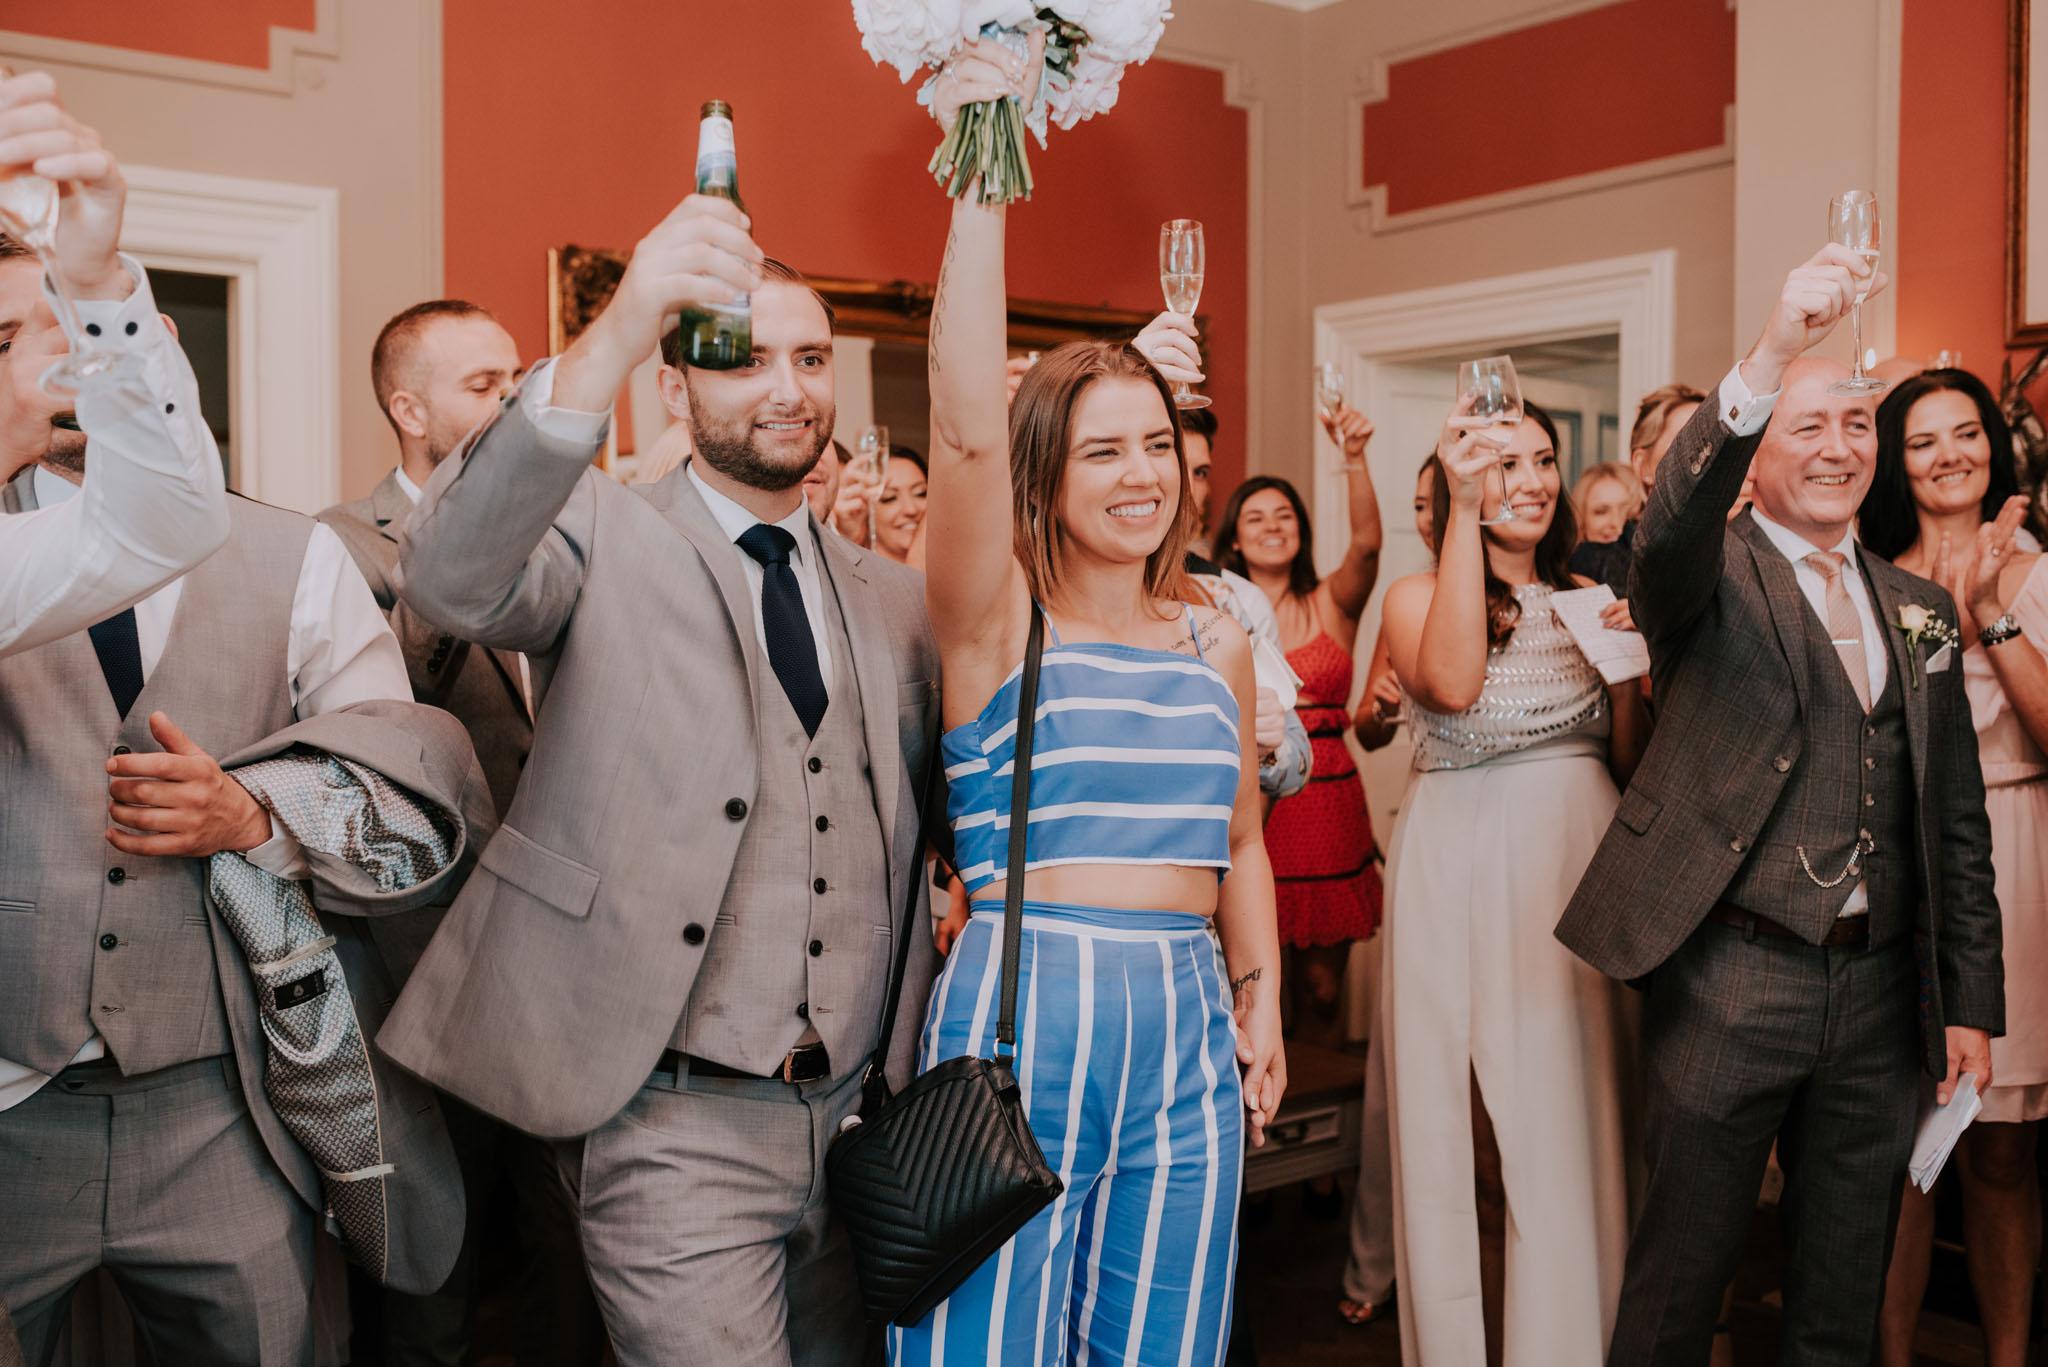 wedding-photographer-glewstone-court-hereford-scott-stockwell-photography428.jpg